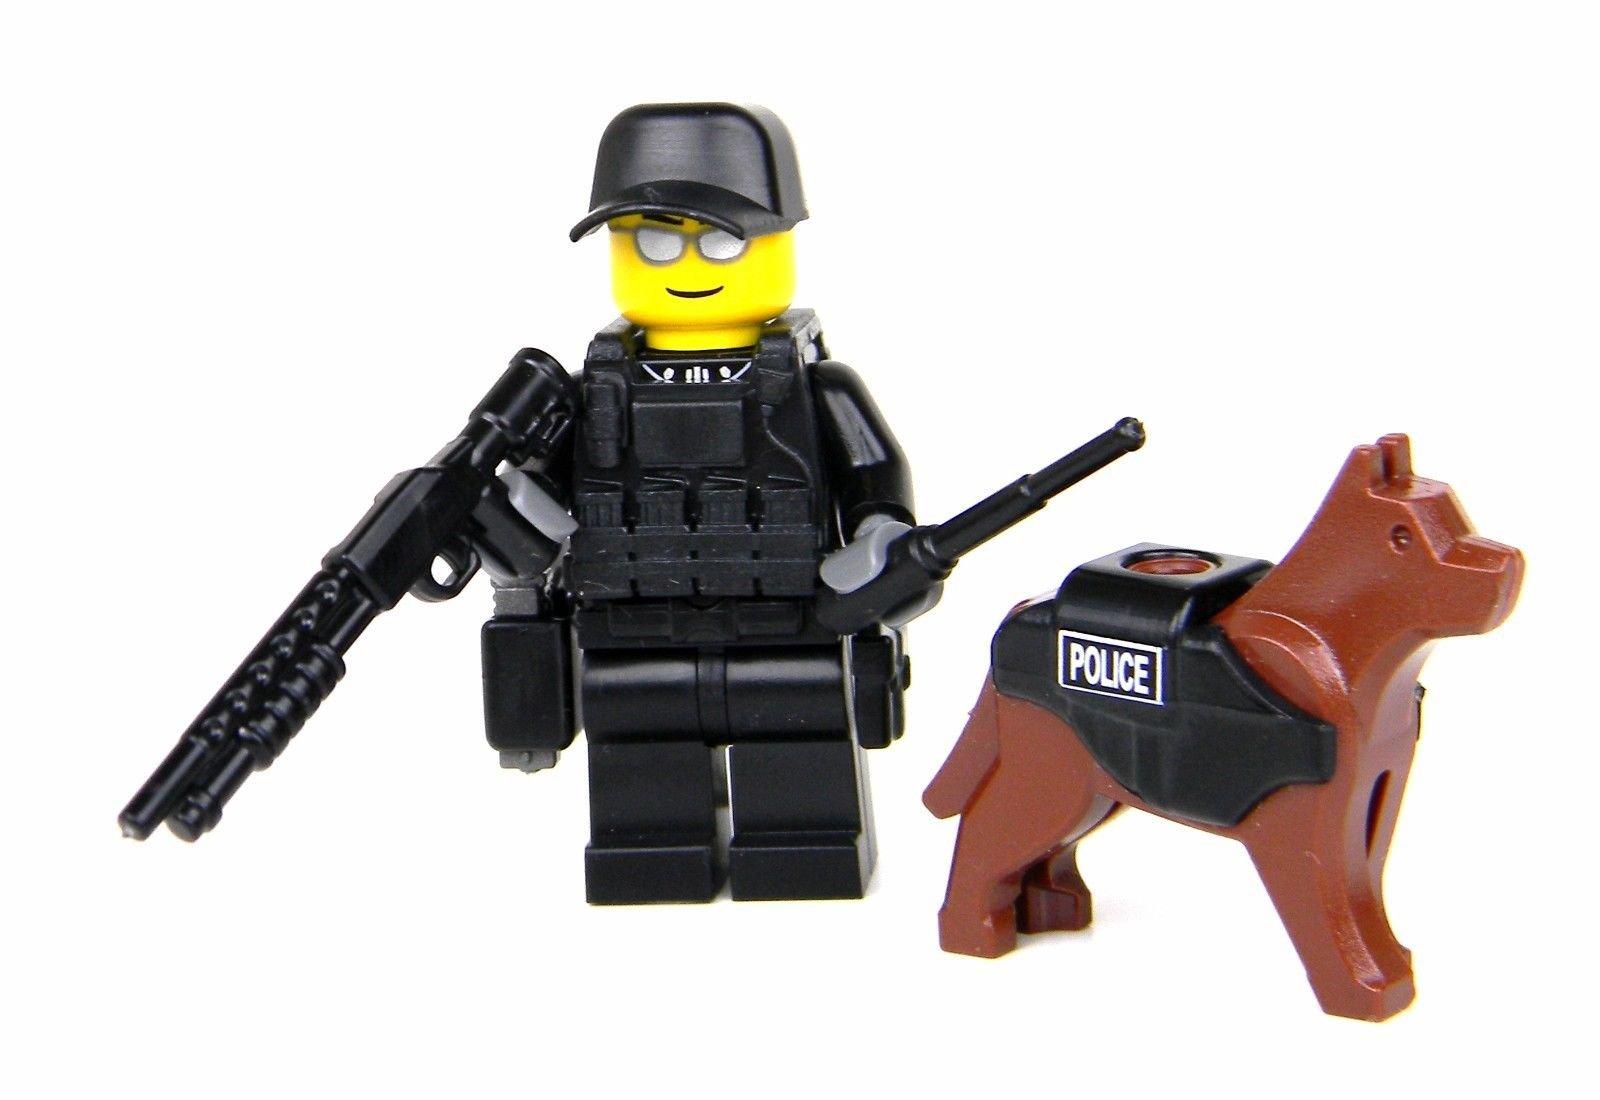 Battle Brick Police K9 Tactical Assault Officer Collectible Custom Minifigure